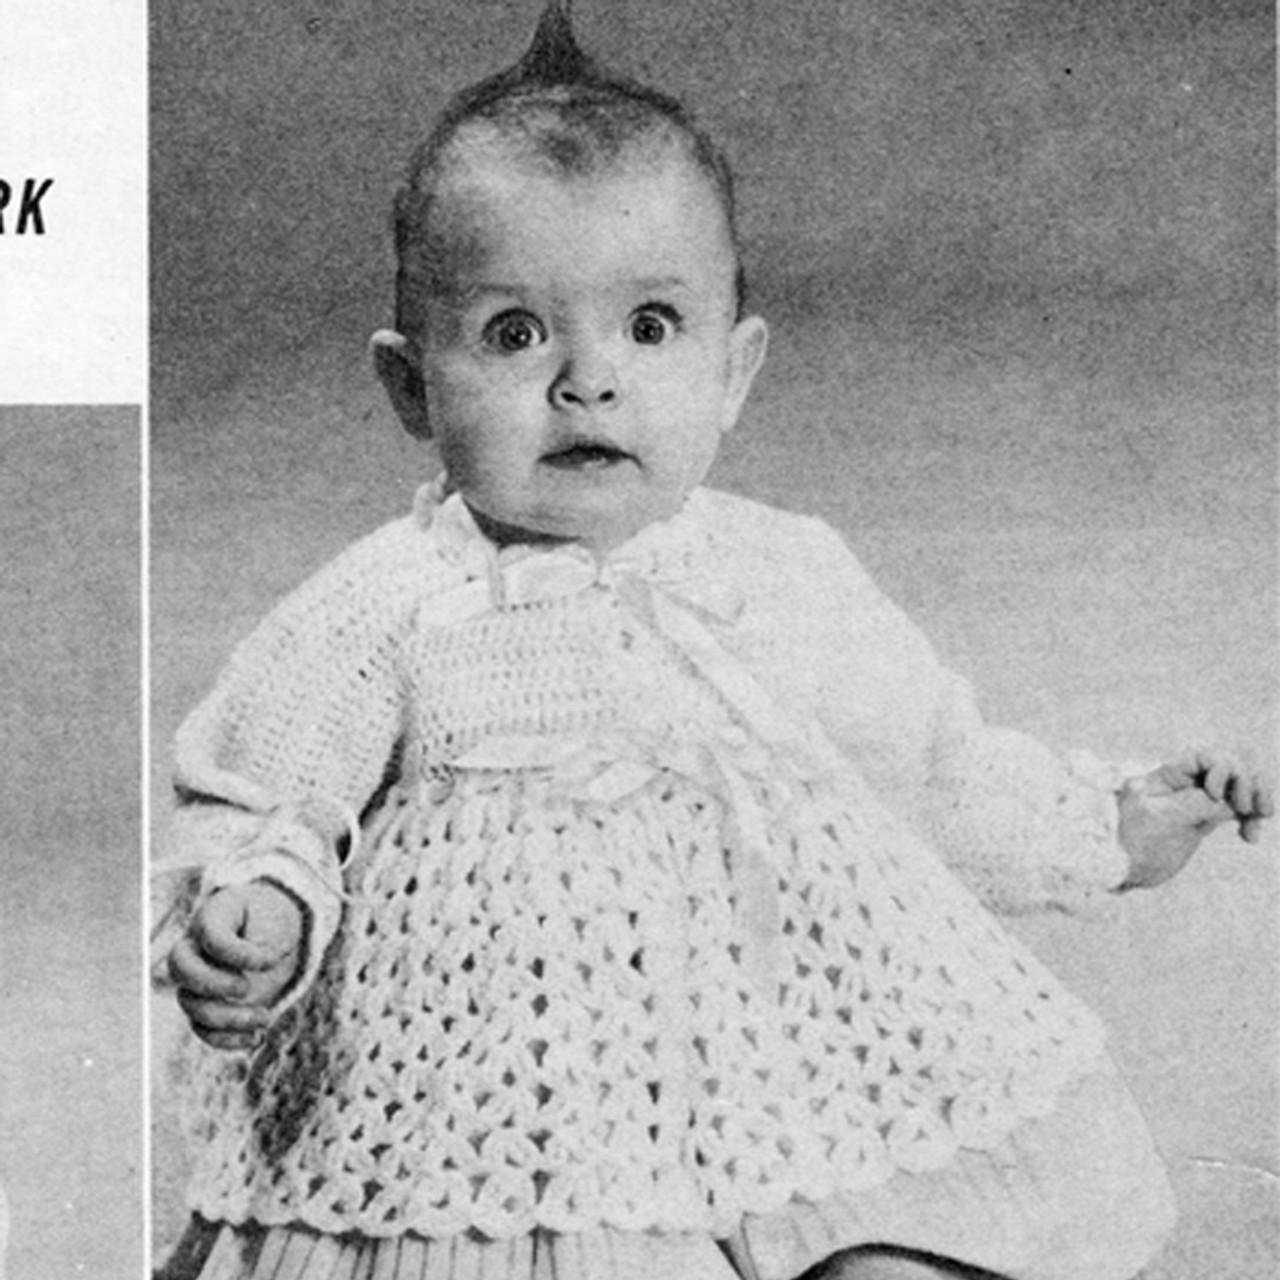 Vintage Crocheted Baby Jacket Pattern